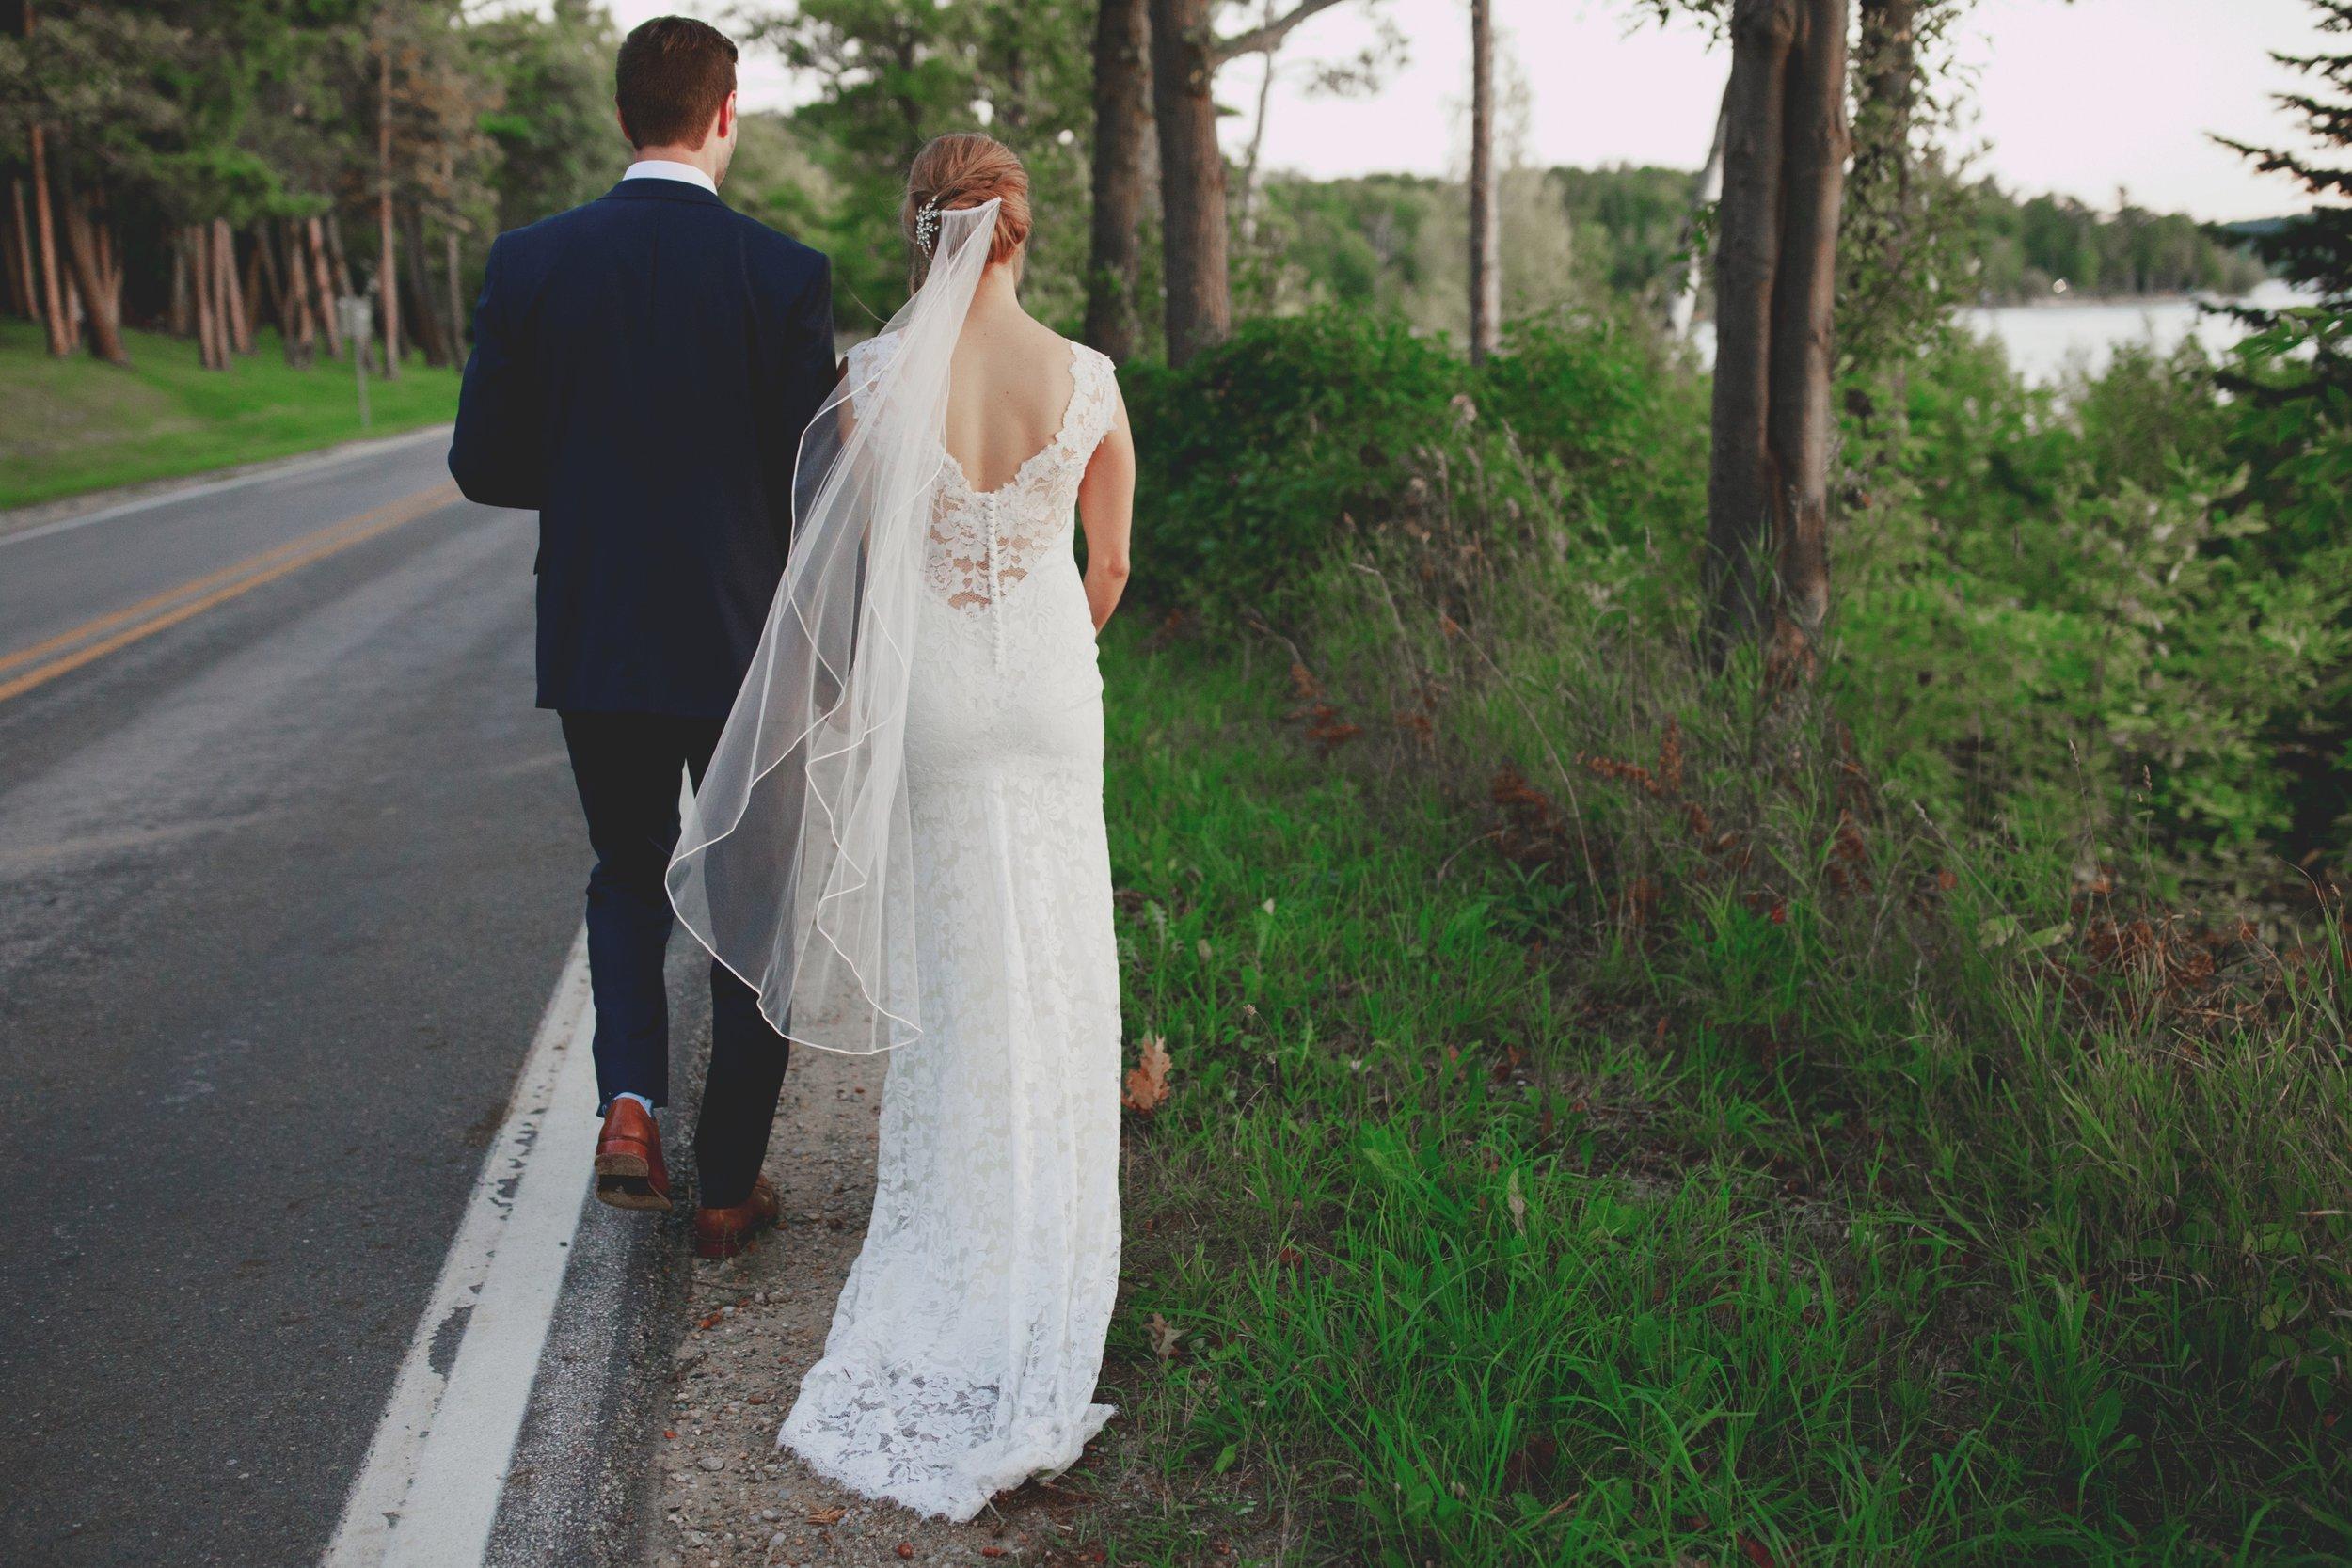 traverse_city_wedding_133.jpg